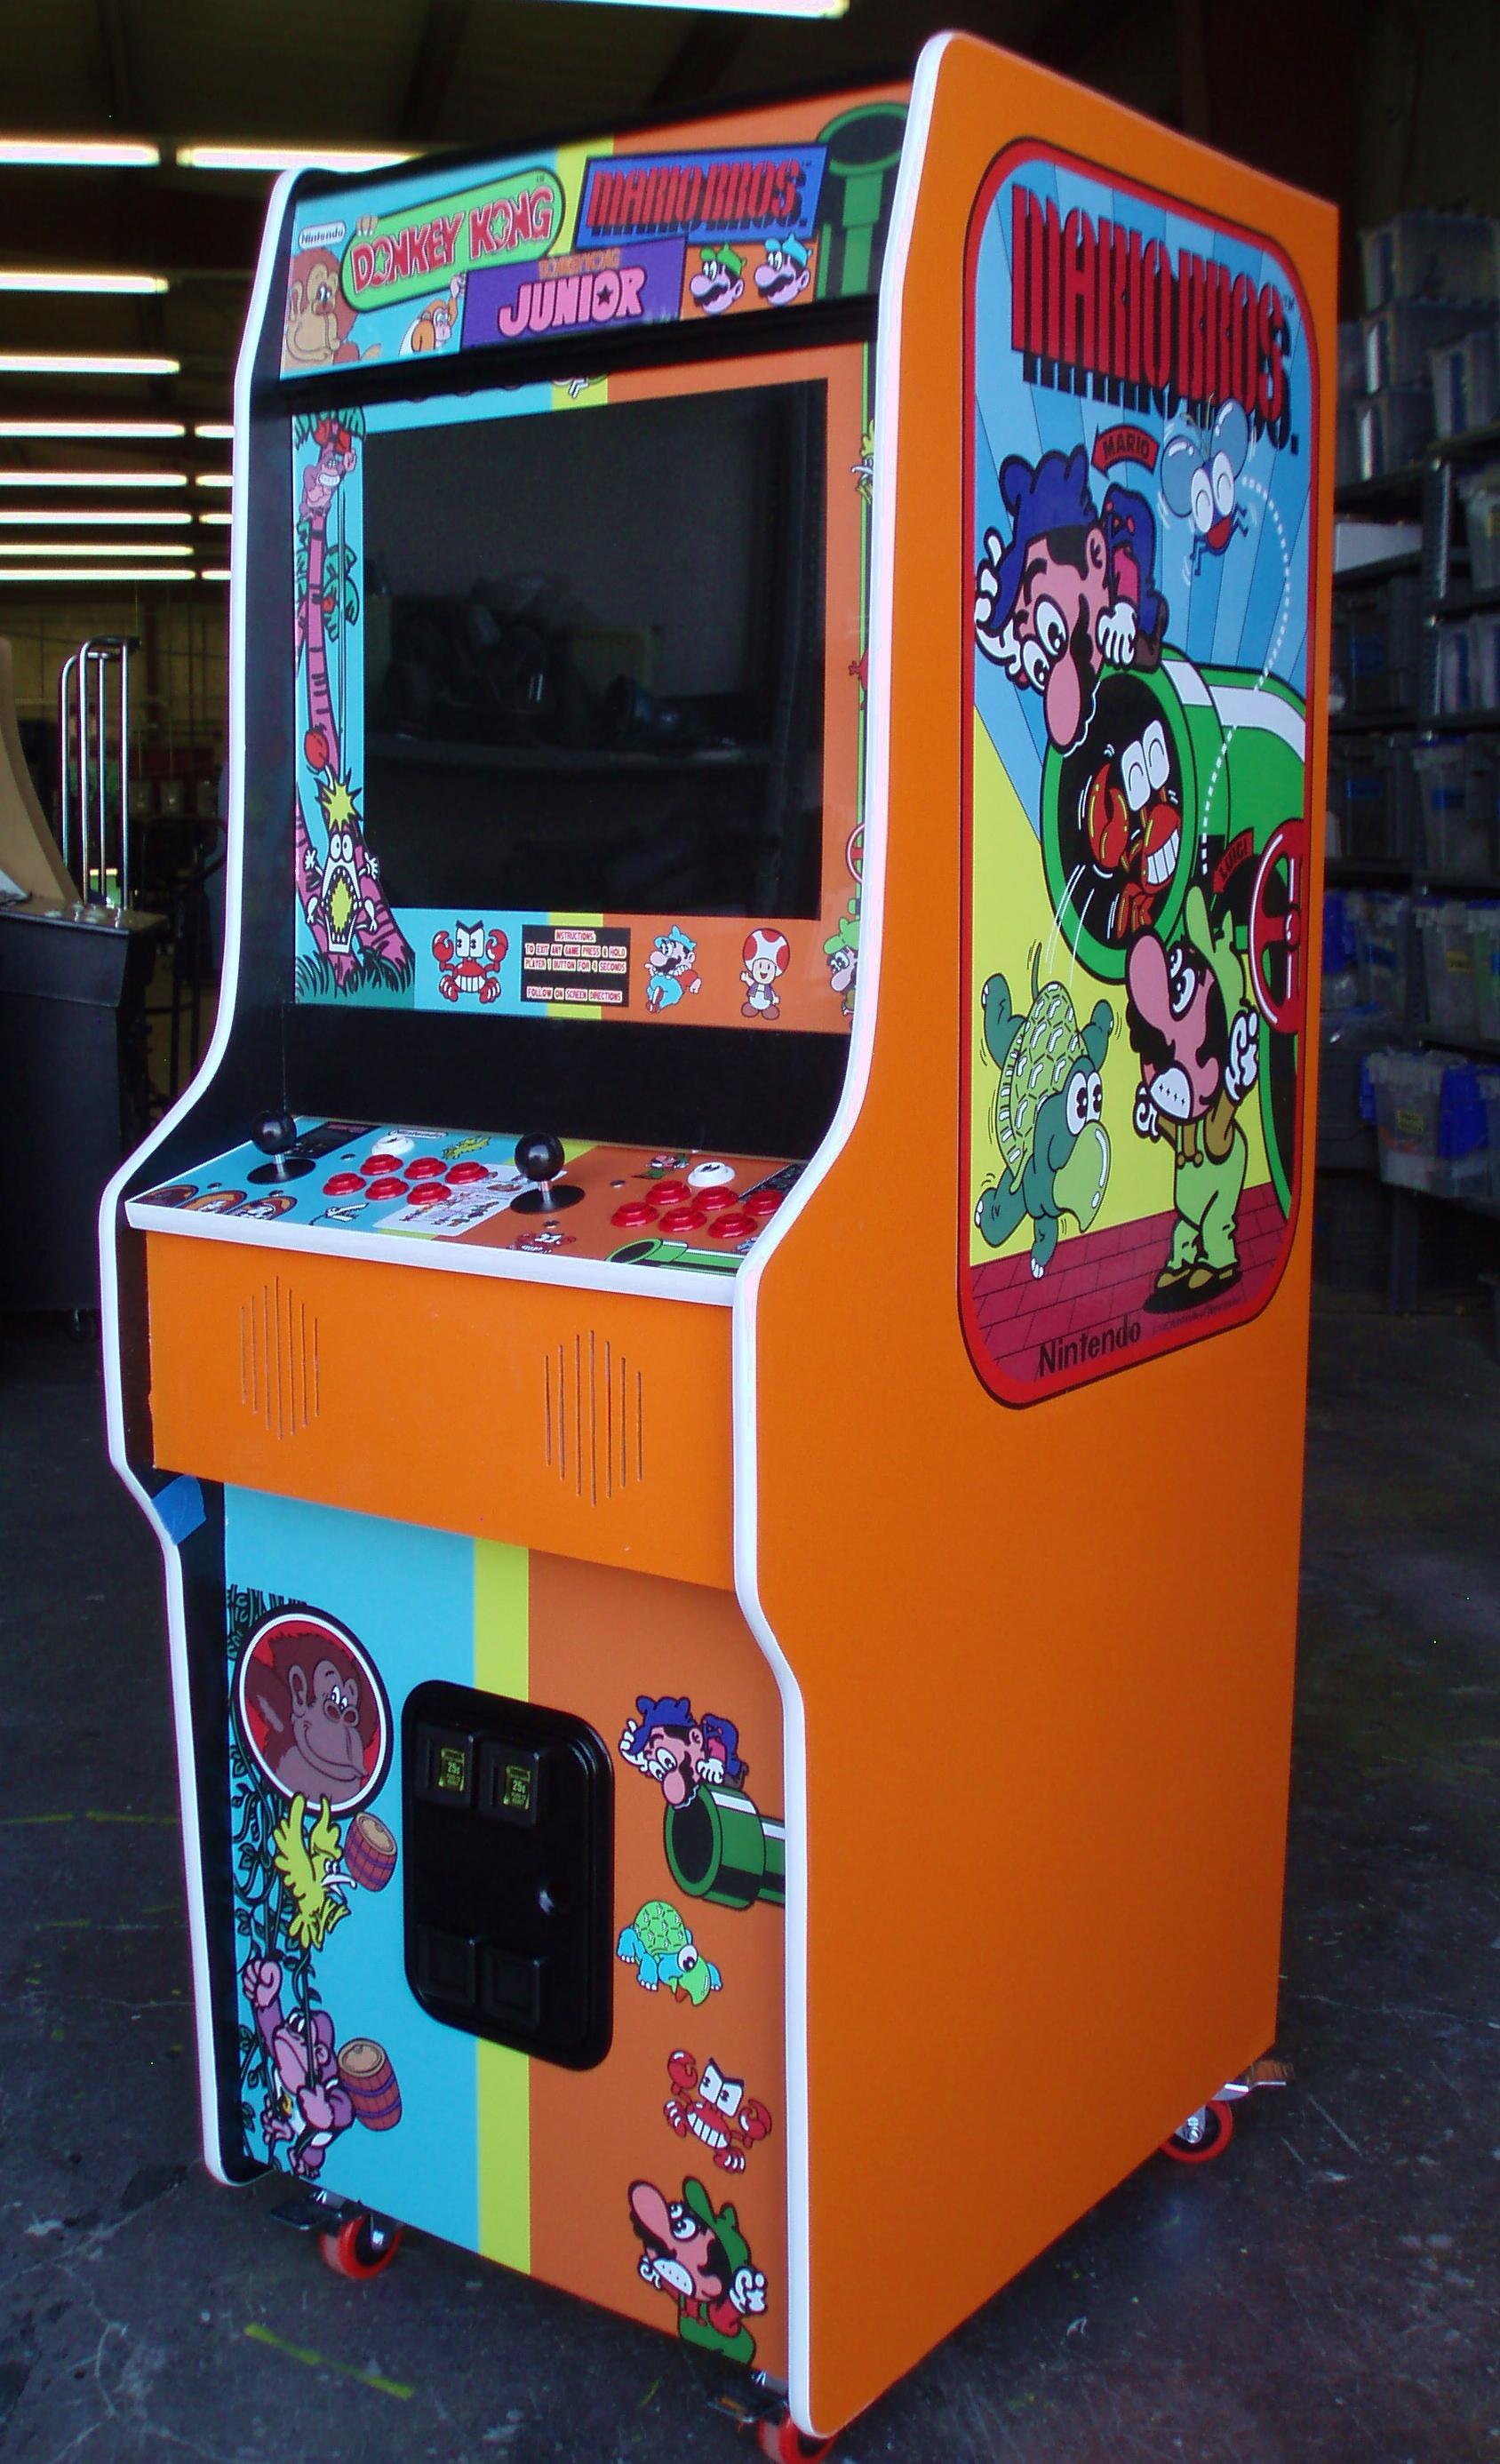 Nintendo Classic Arcade Video Game Photo Gallery - AceAmusements.us